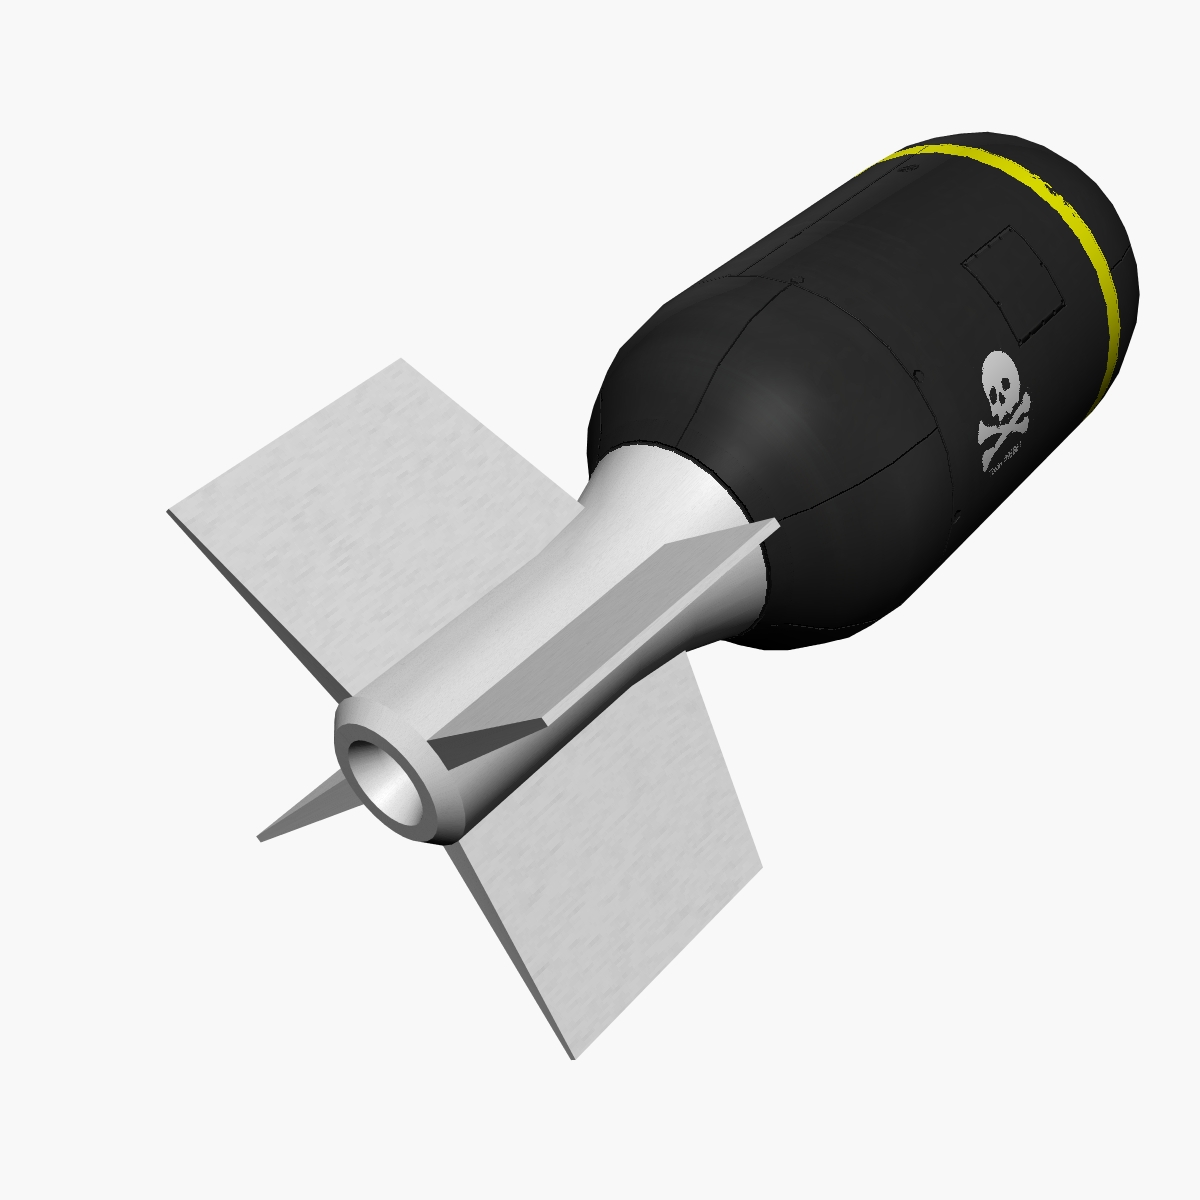 Bomb, Jolly Roger scheme 3d model 3ds dxf fbx blend cob dae X obj 162667